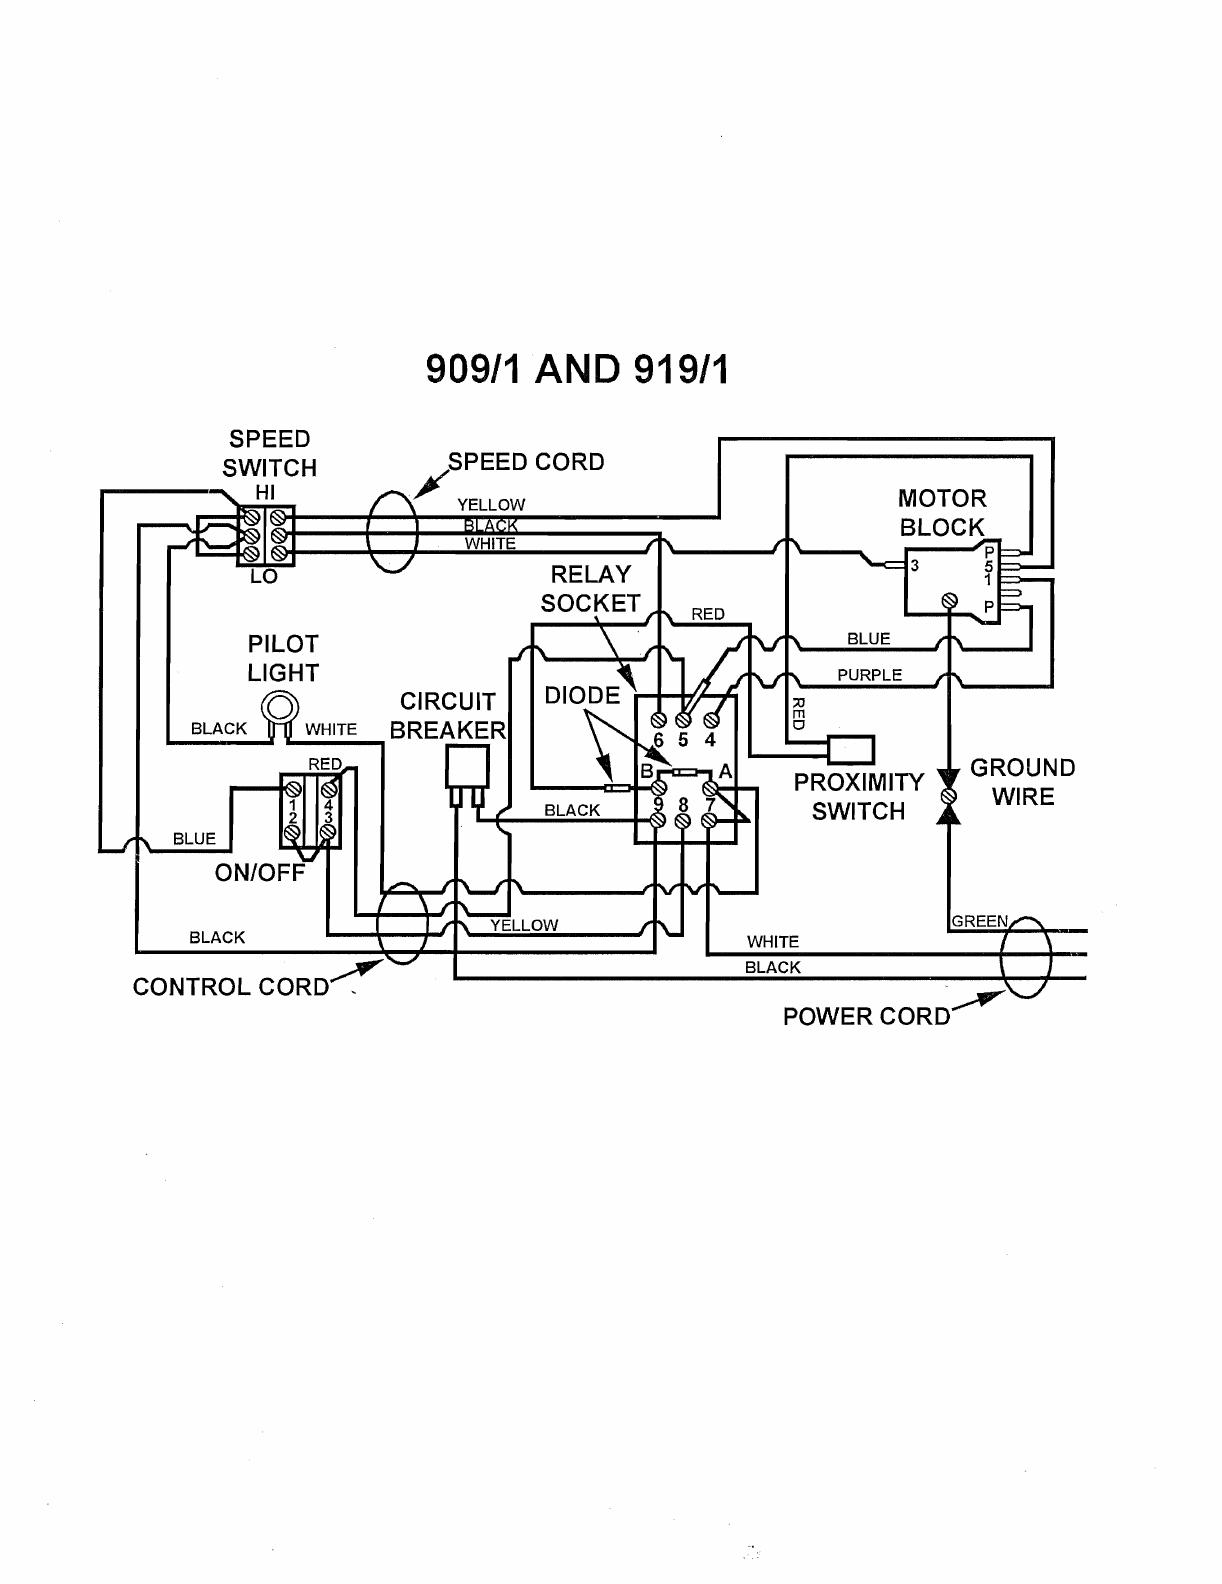 hight resolution of berkel wiring diagram wiring diagrams explo berkel 909 wiring diagram berkel 9091 user manual to the